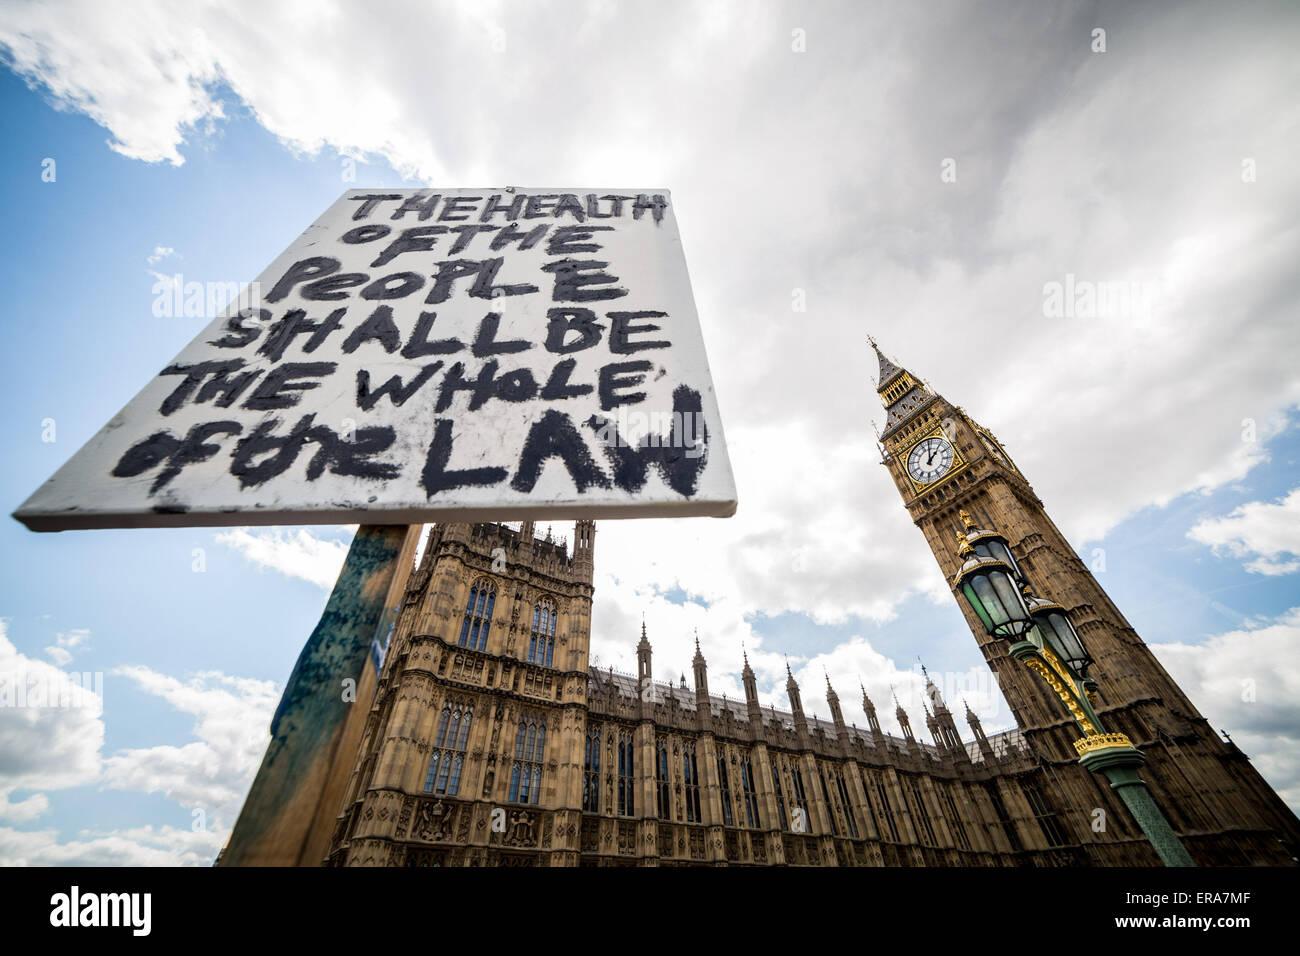 London, UK. 30th May, 2015. Anti-Austerity Protest on Westminster Bridge Credit:  Guy Corbishley/Alamy Live News - Stock Image